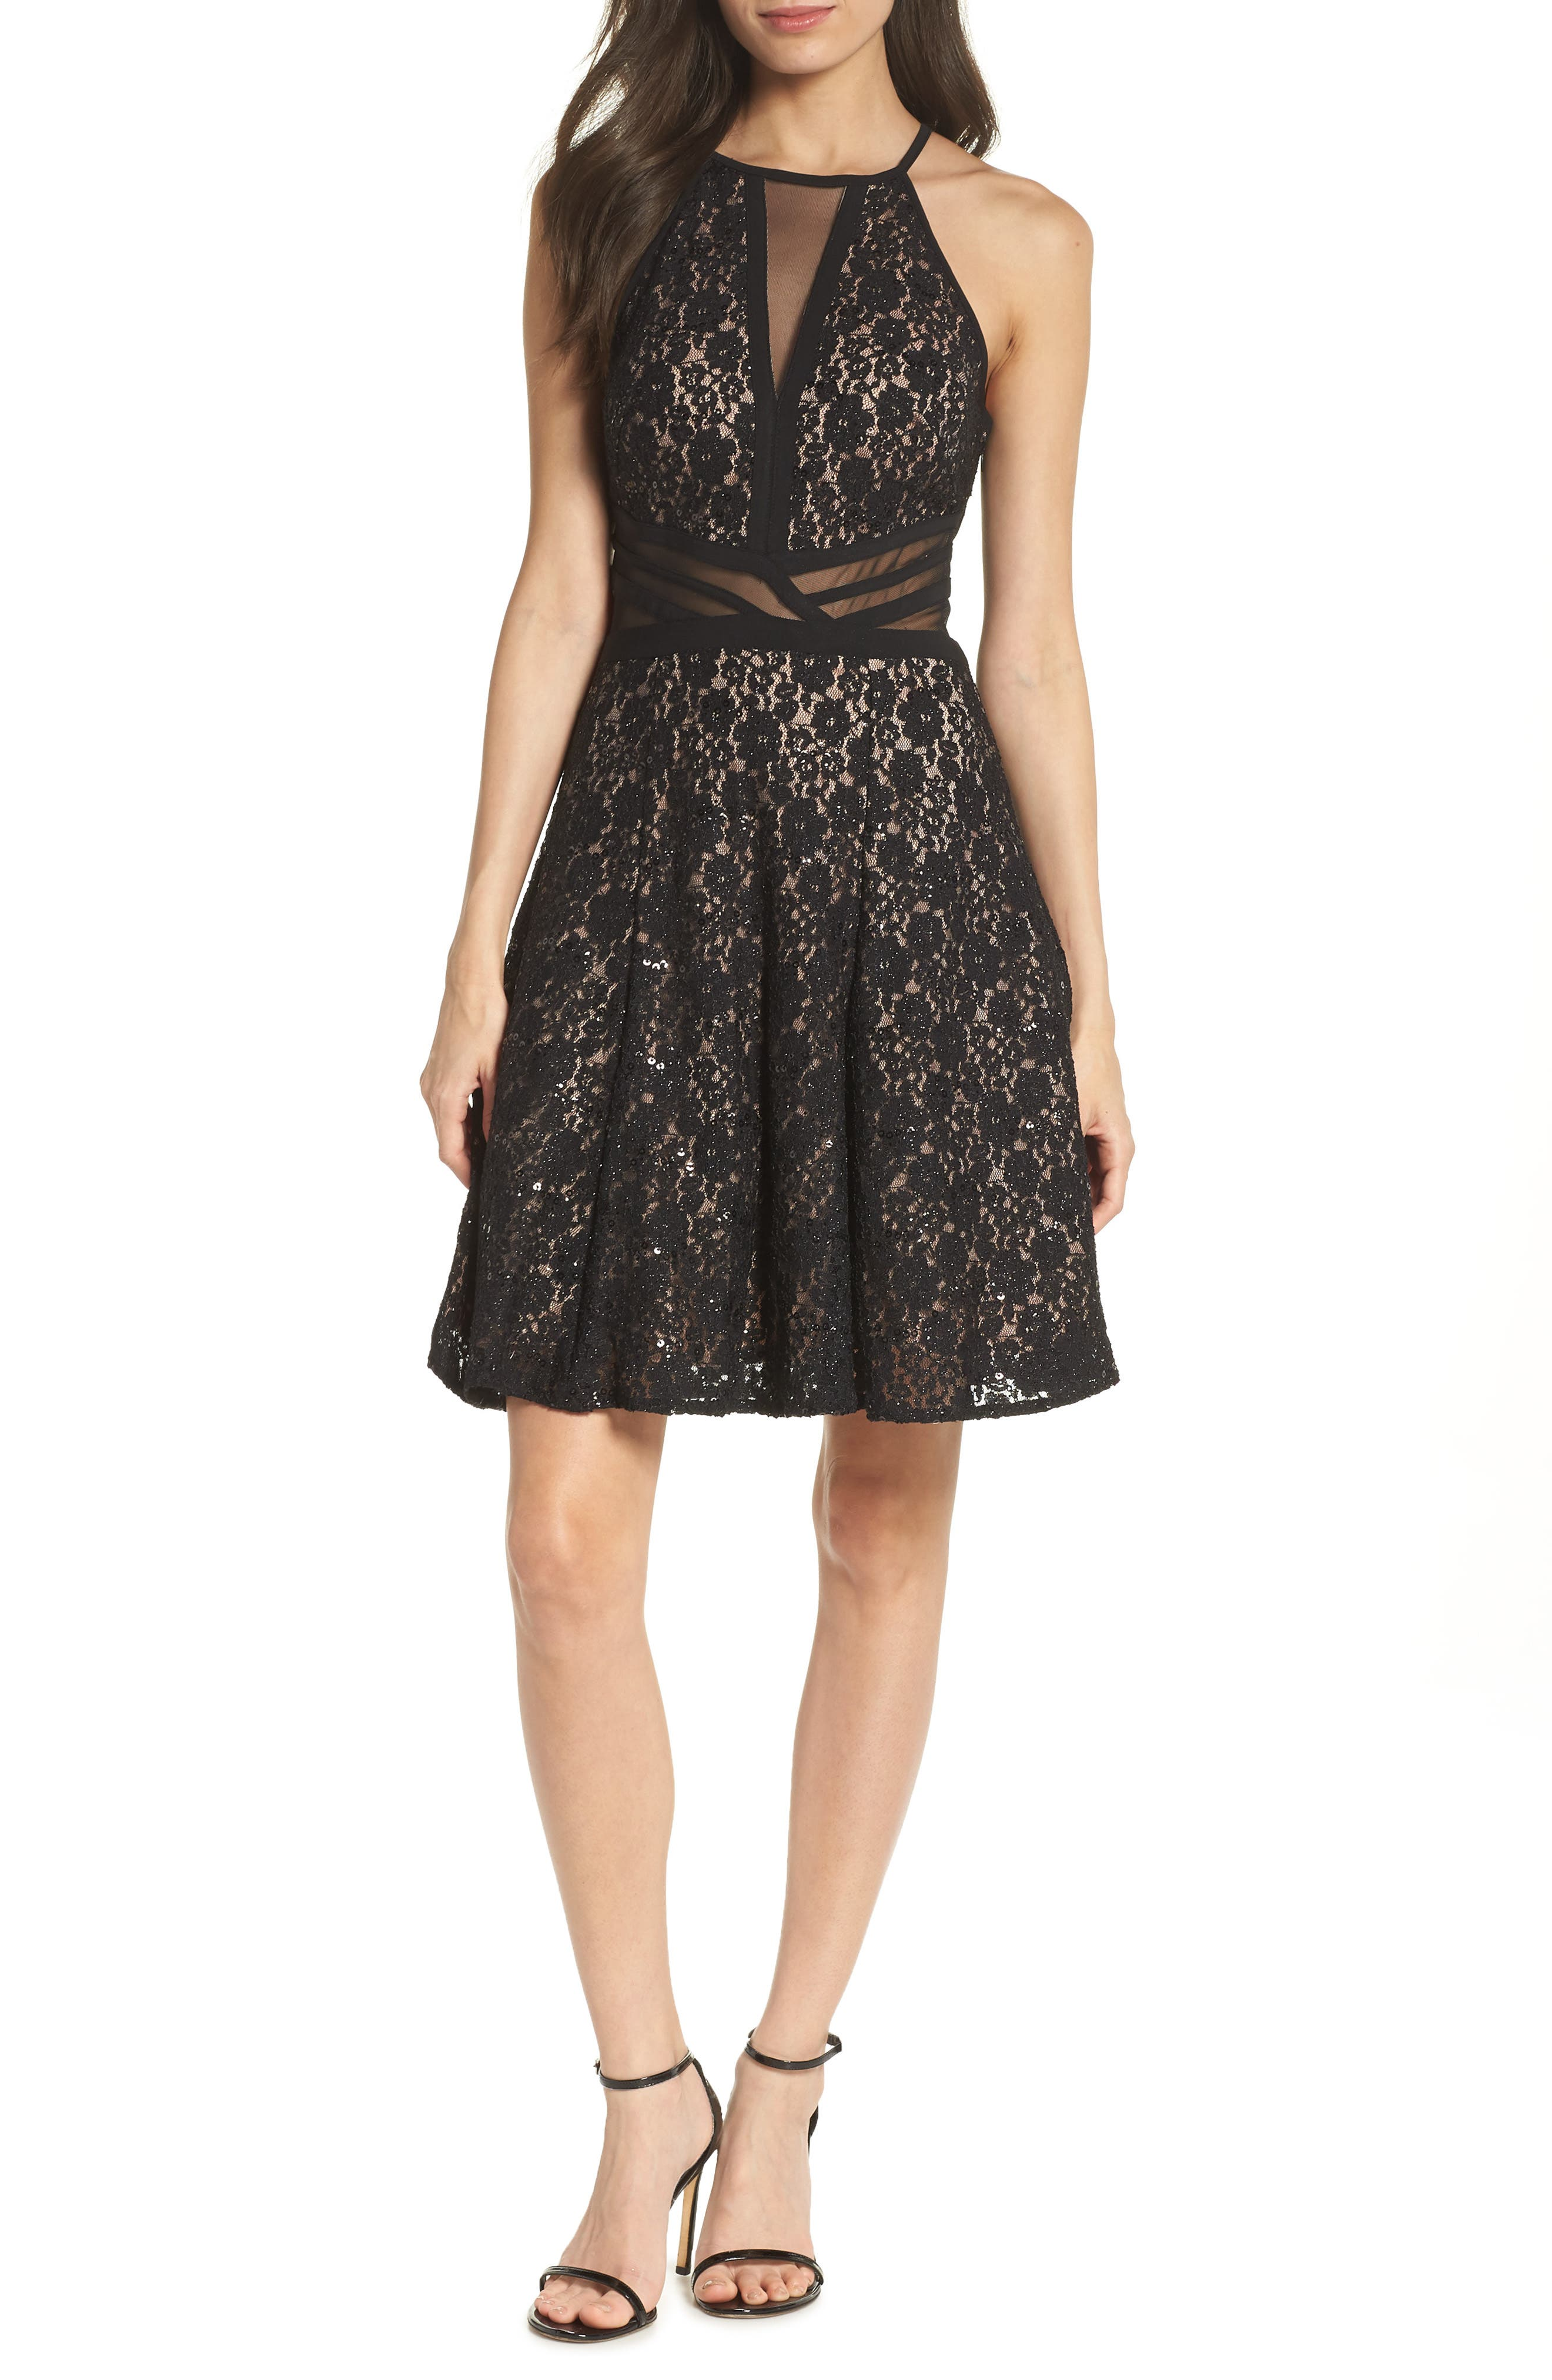 MORGAN & CO., Sheer Inset Lace Fit & Flare Dress, Main thumbnail 1, color, BLACK/ NUDE